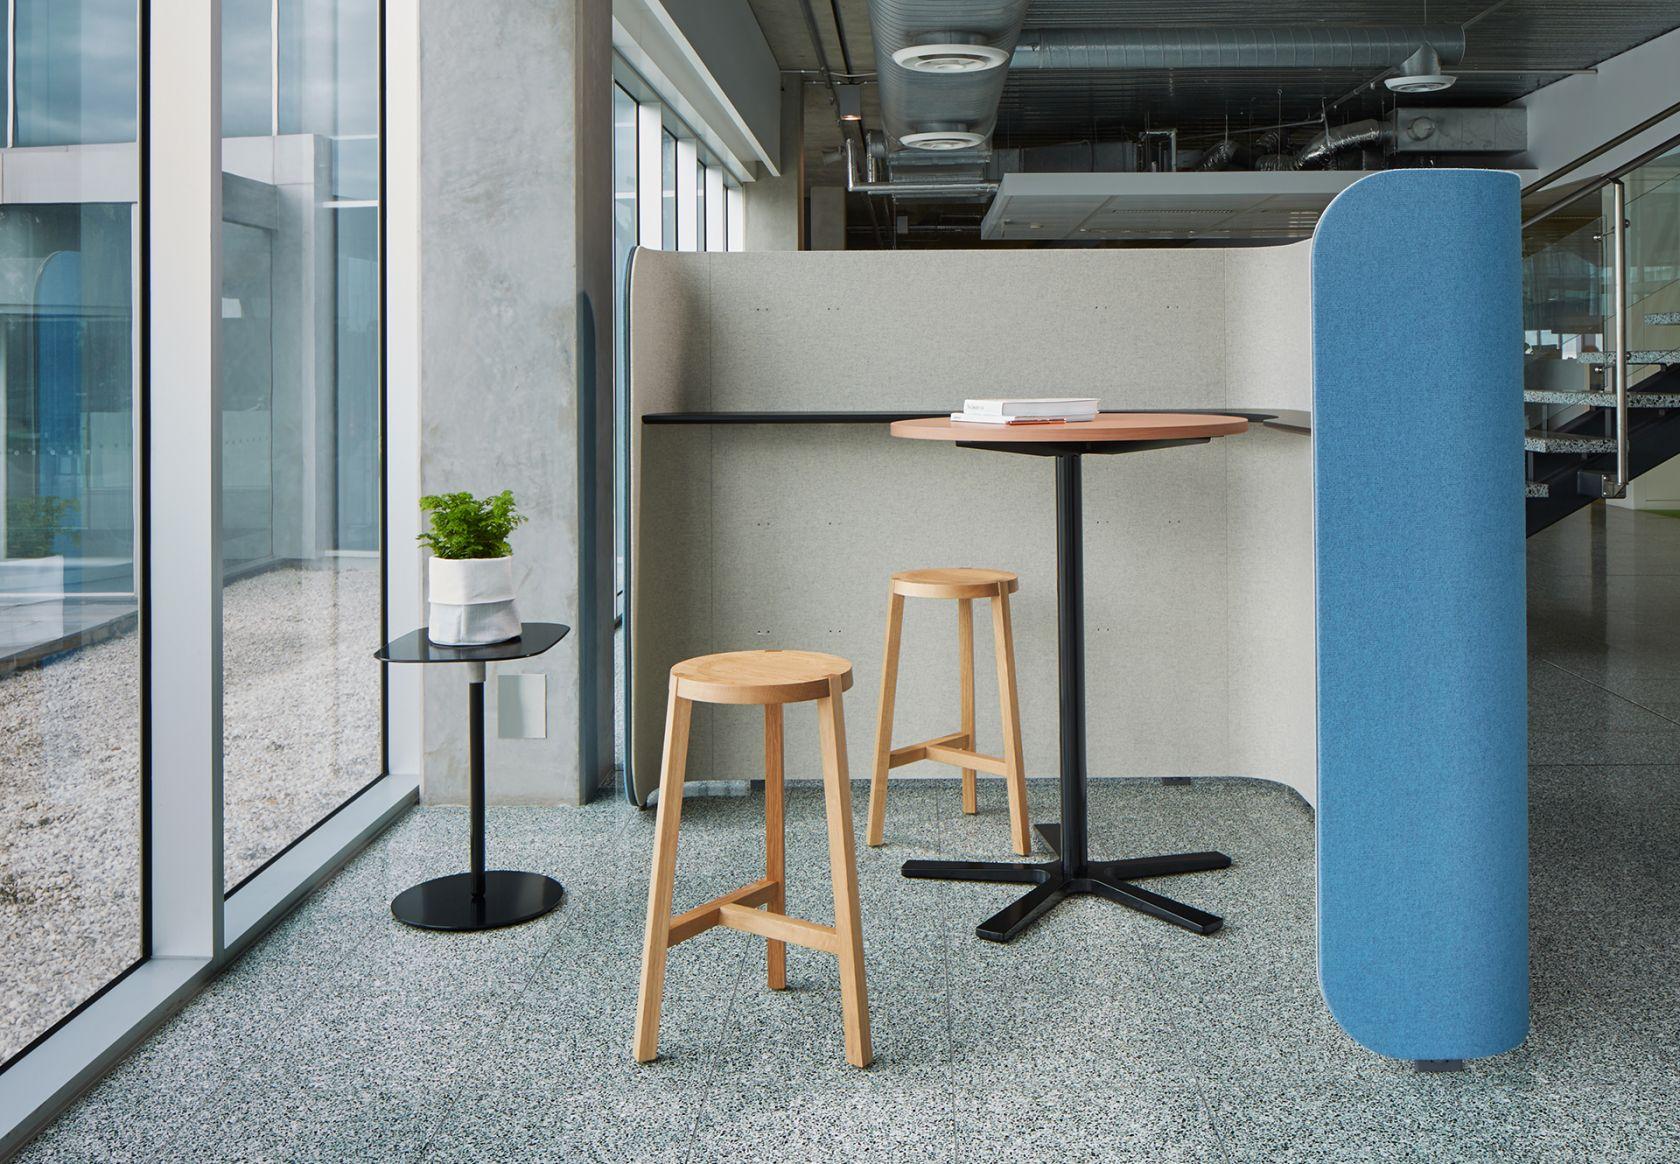 toro-stools